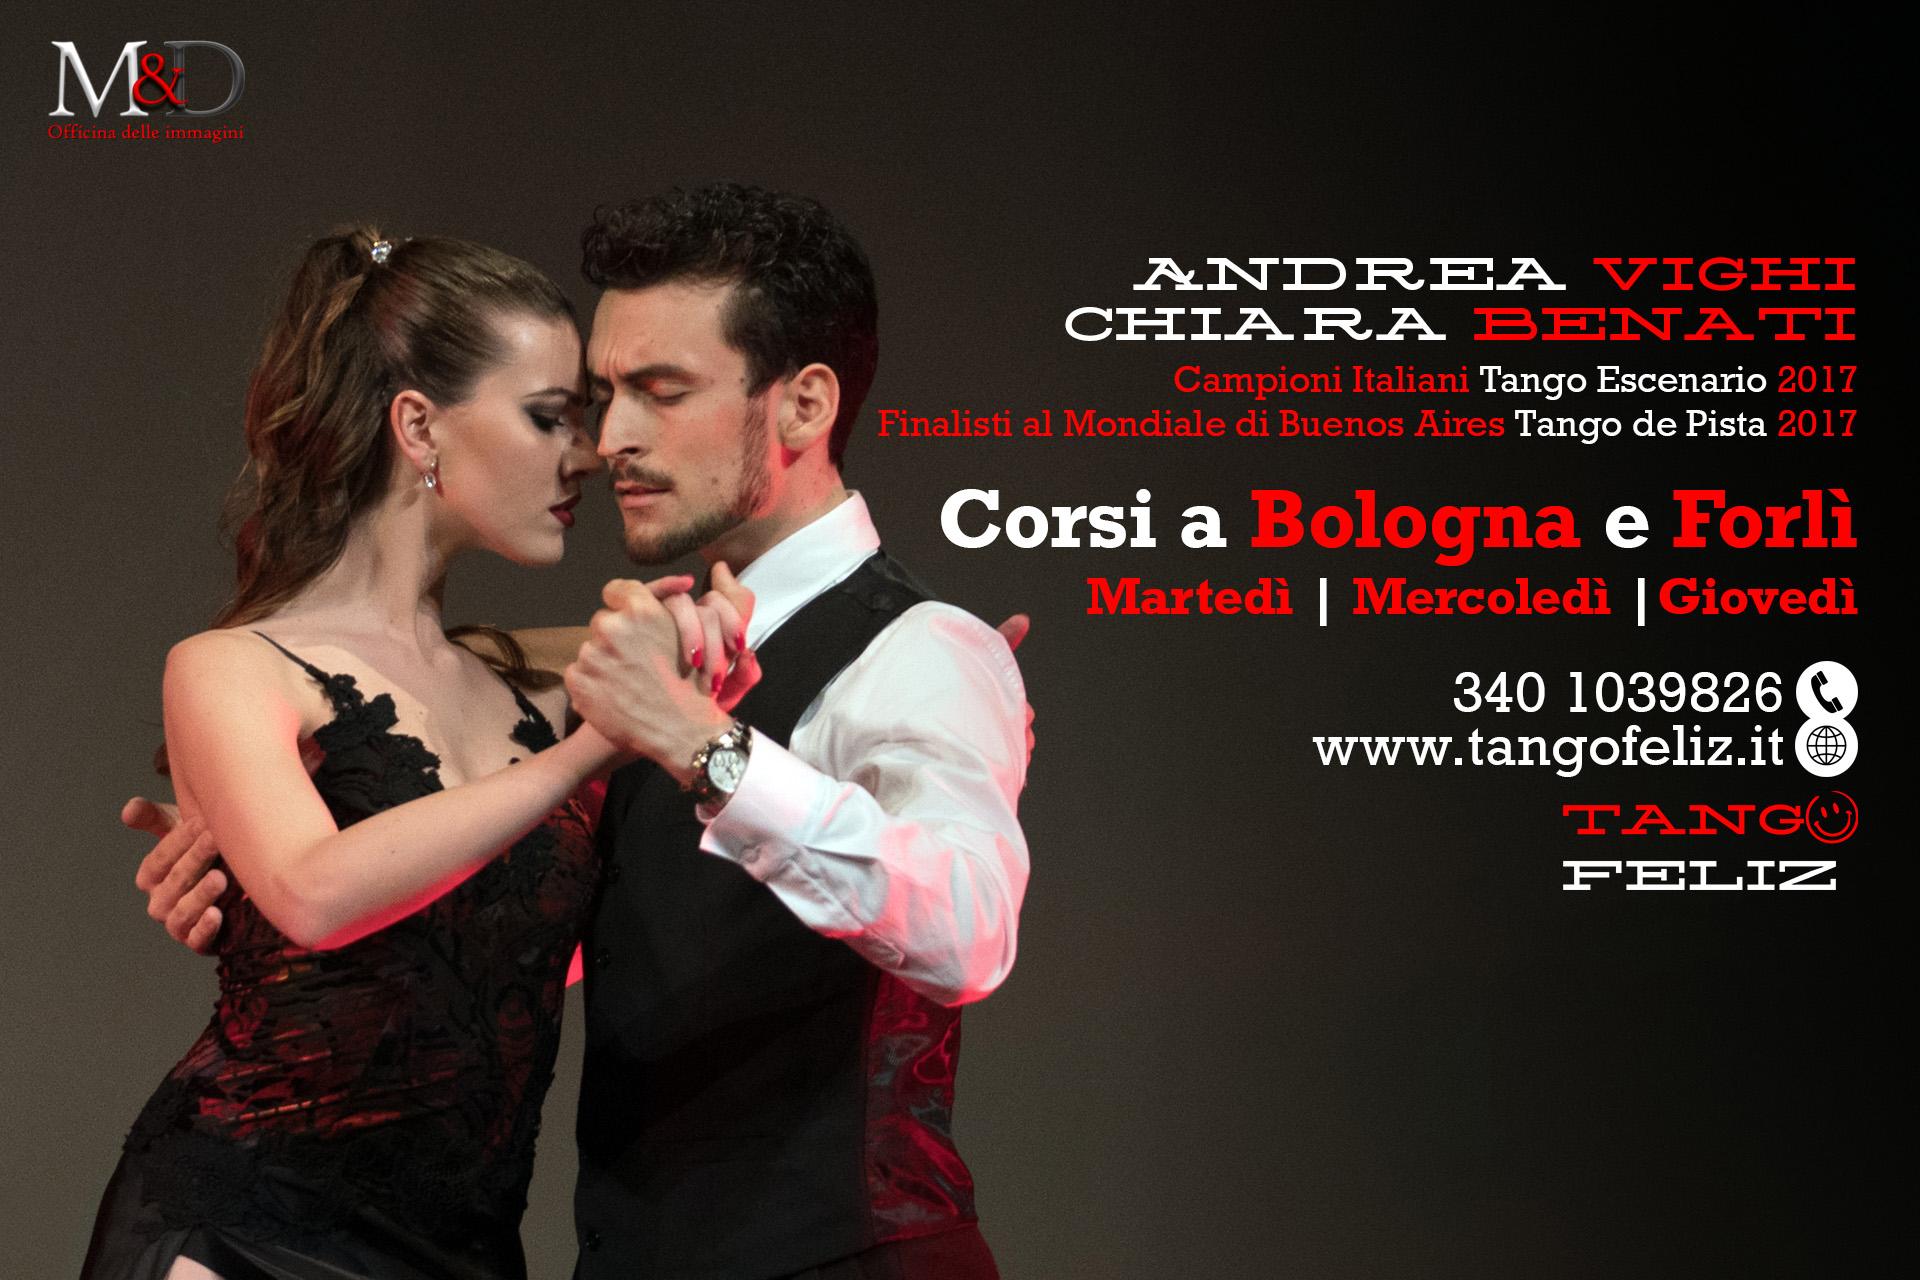 corsi di tango a Bologna con Andrea Vighi y Chiara Benati Tango Feliz